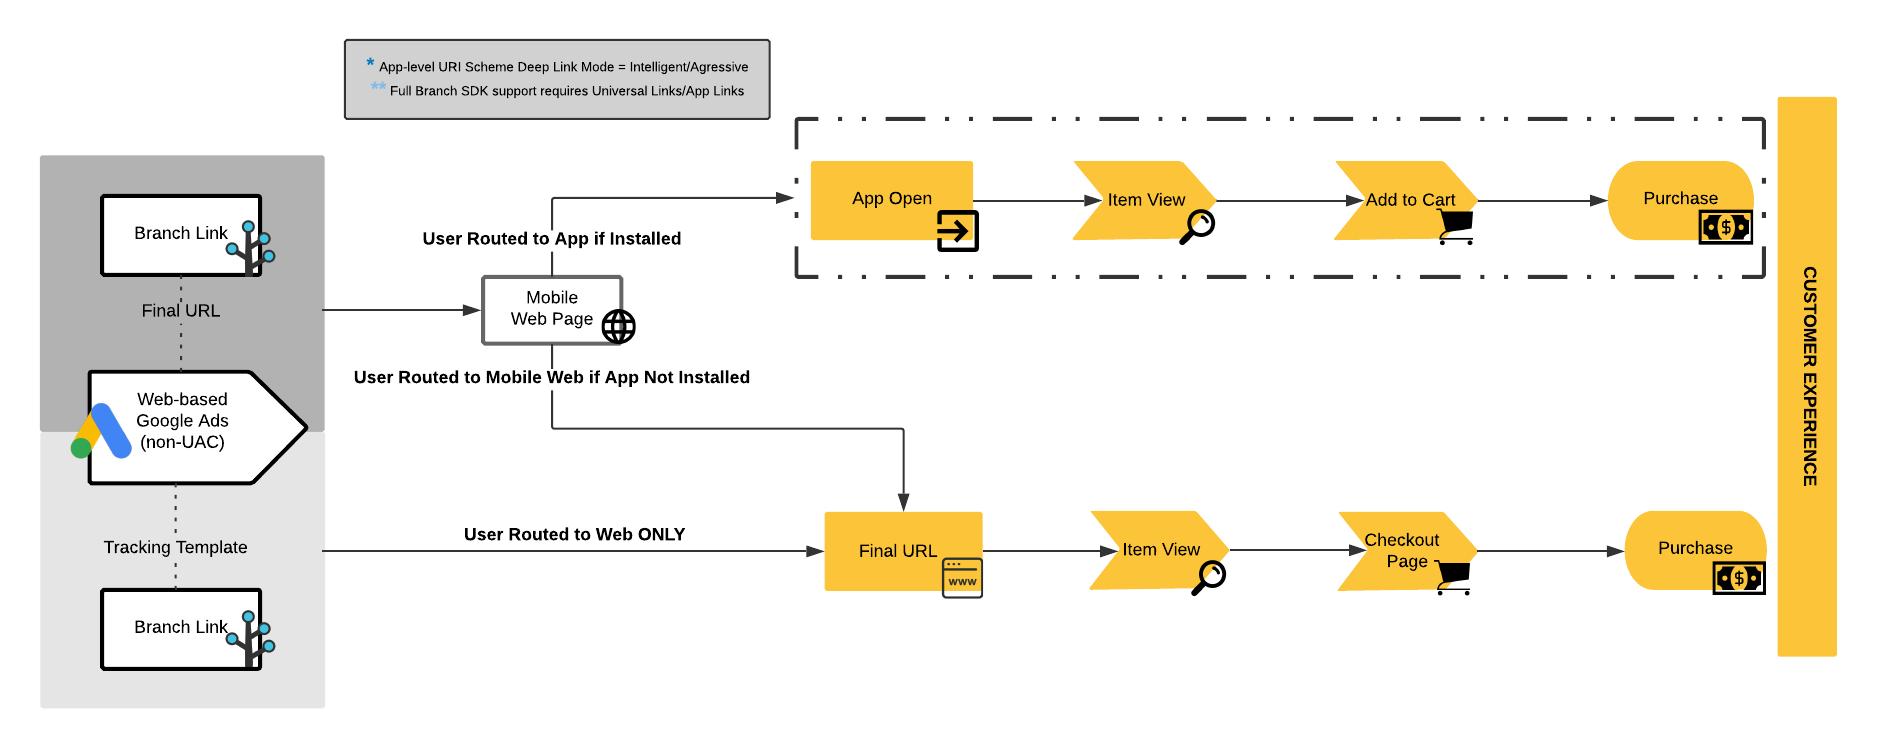 Web-based Ads (non-UAC) - Branch Docs